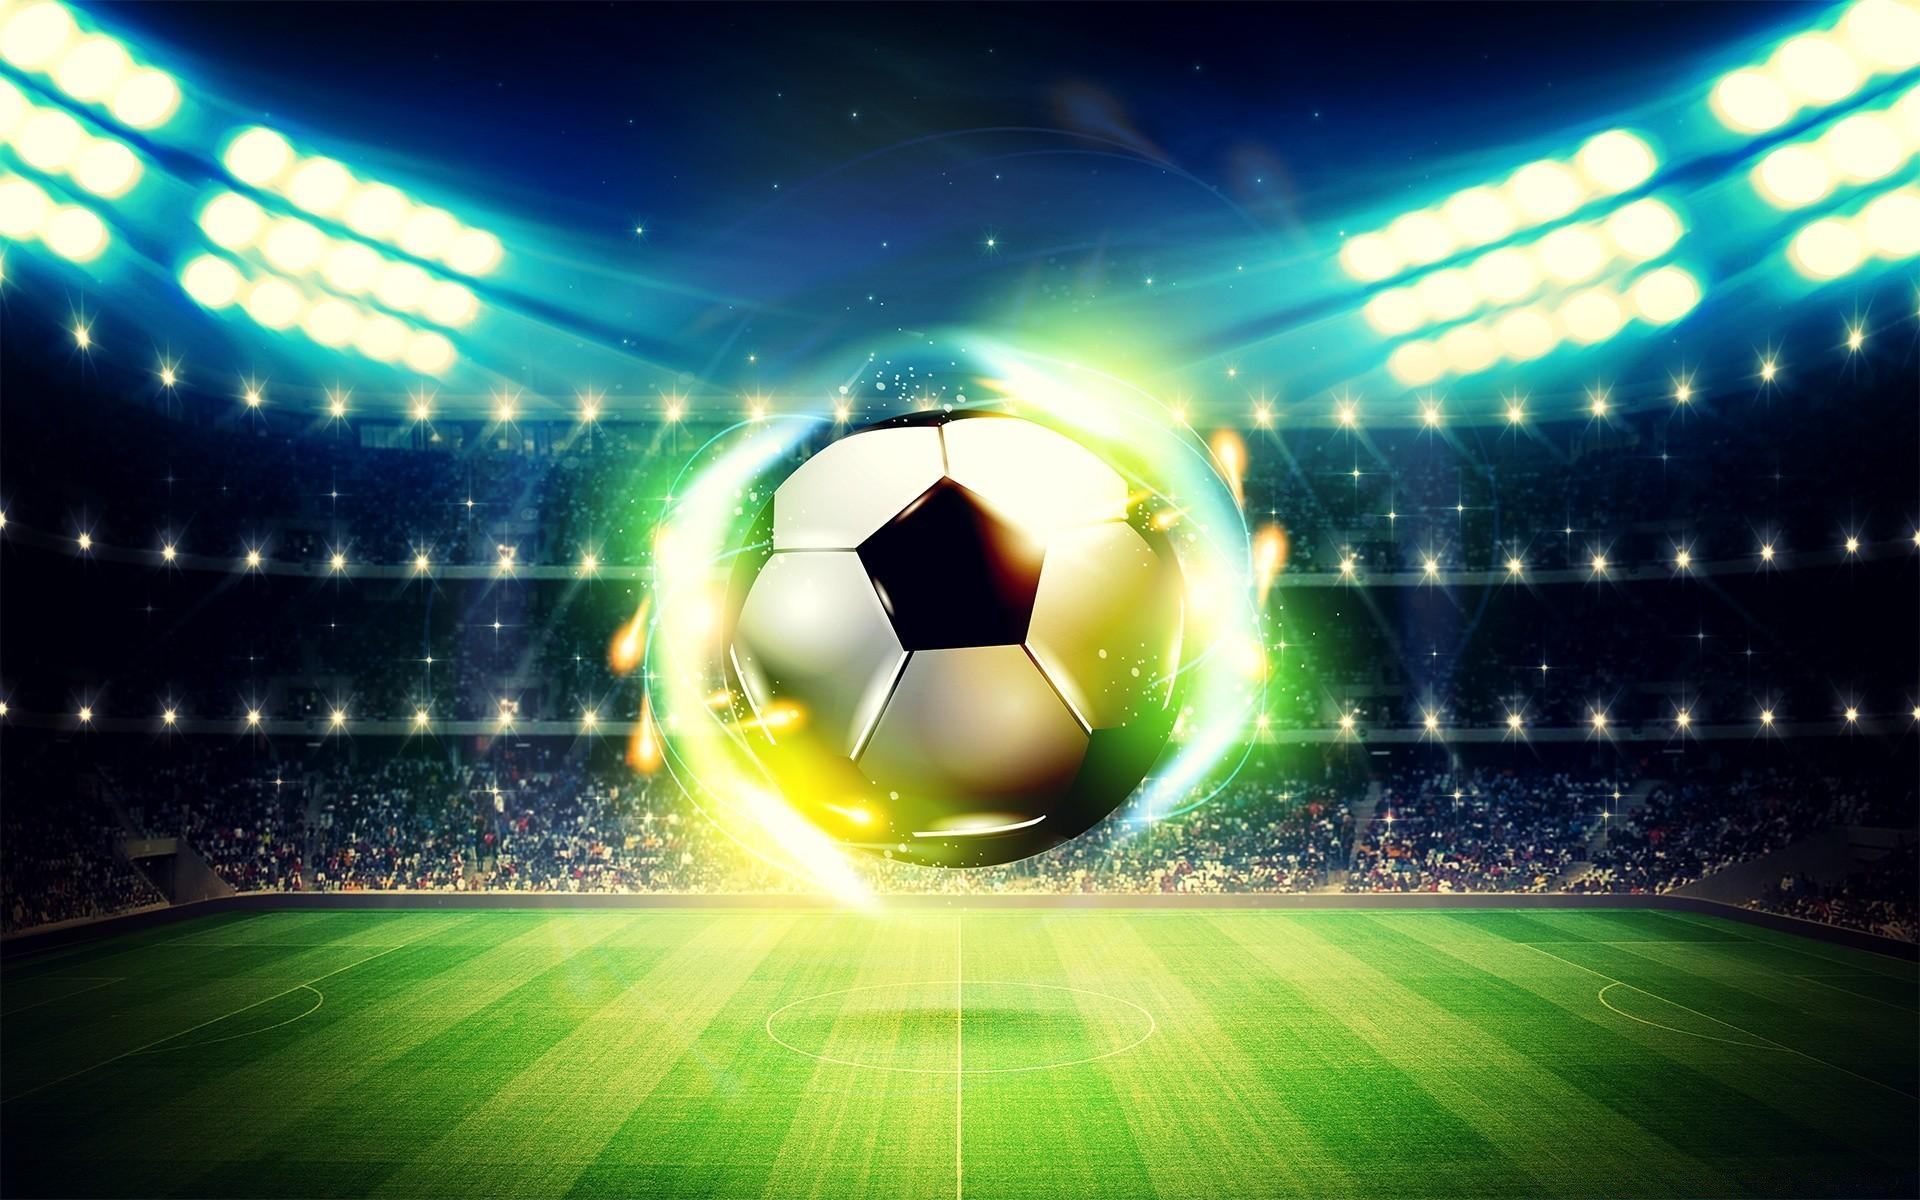 Картинка футбол на заставку